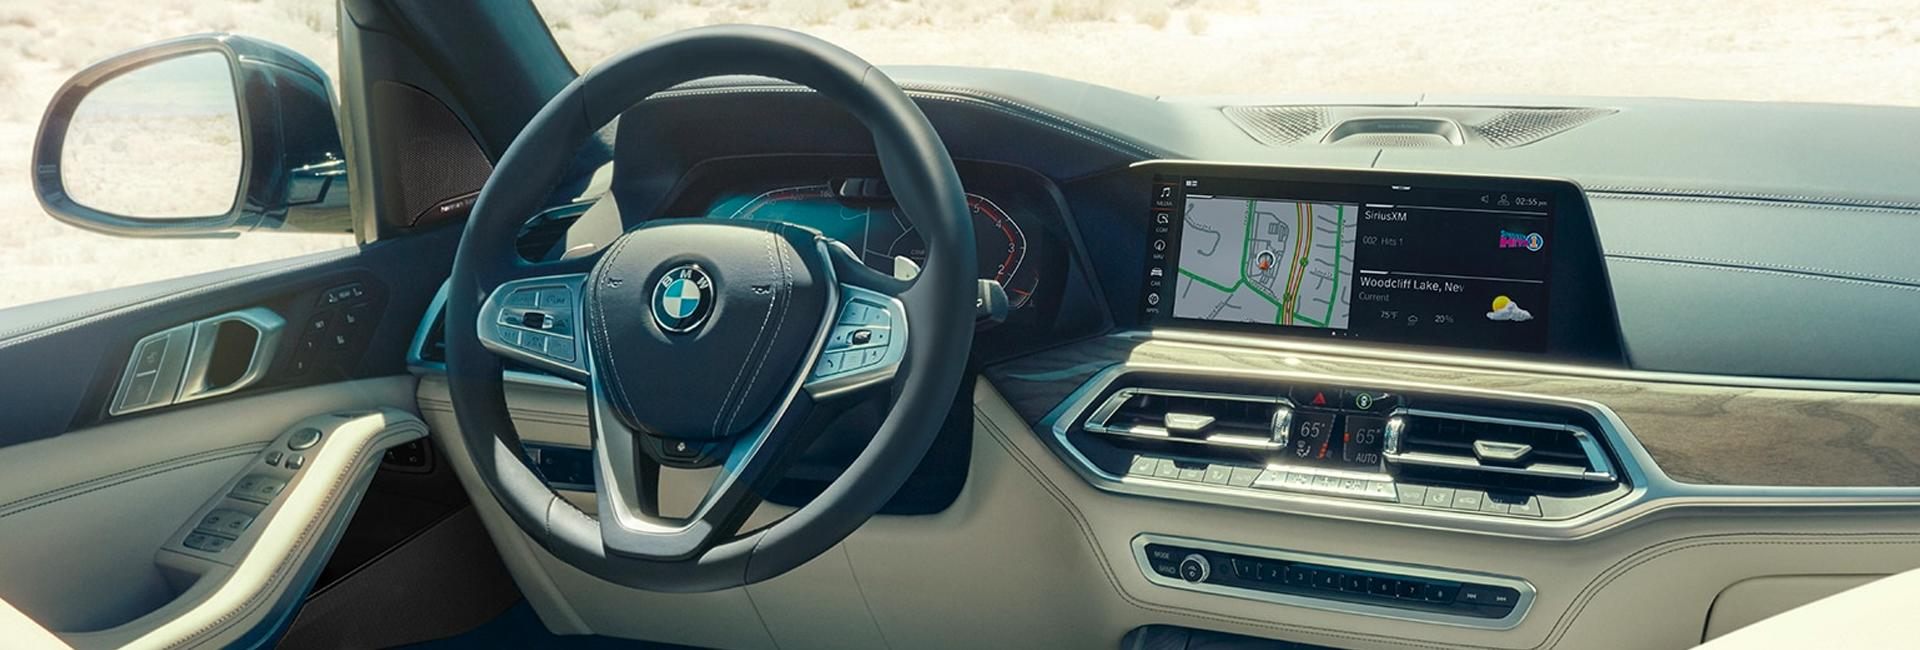 Full interior view of the 2021 X7 luxury interior